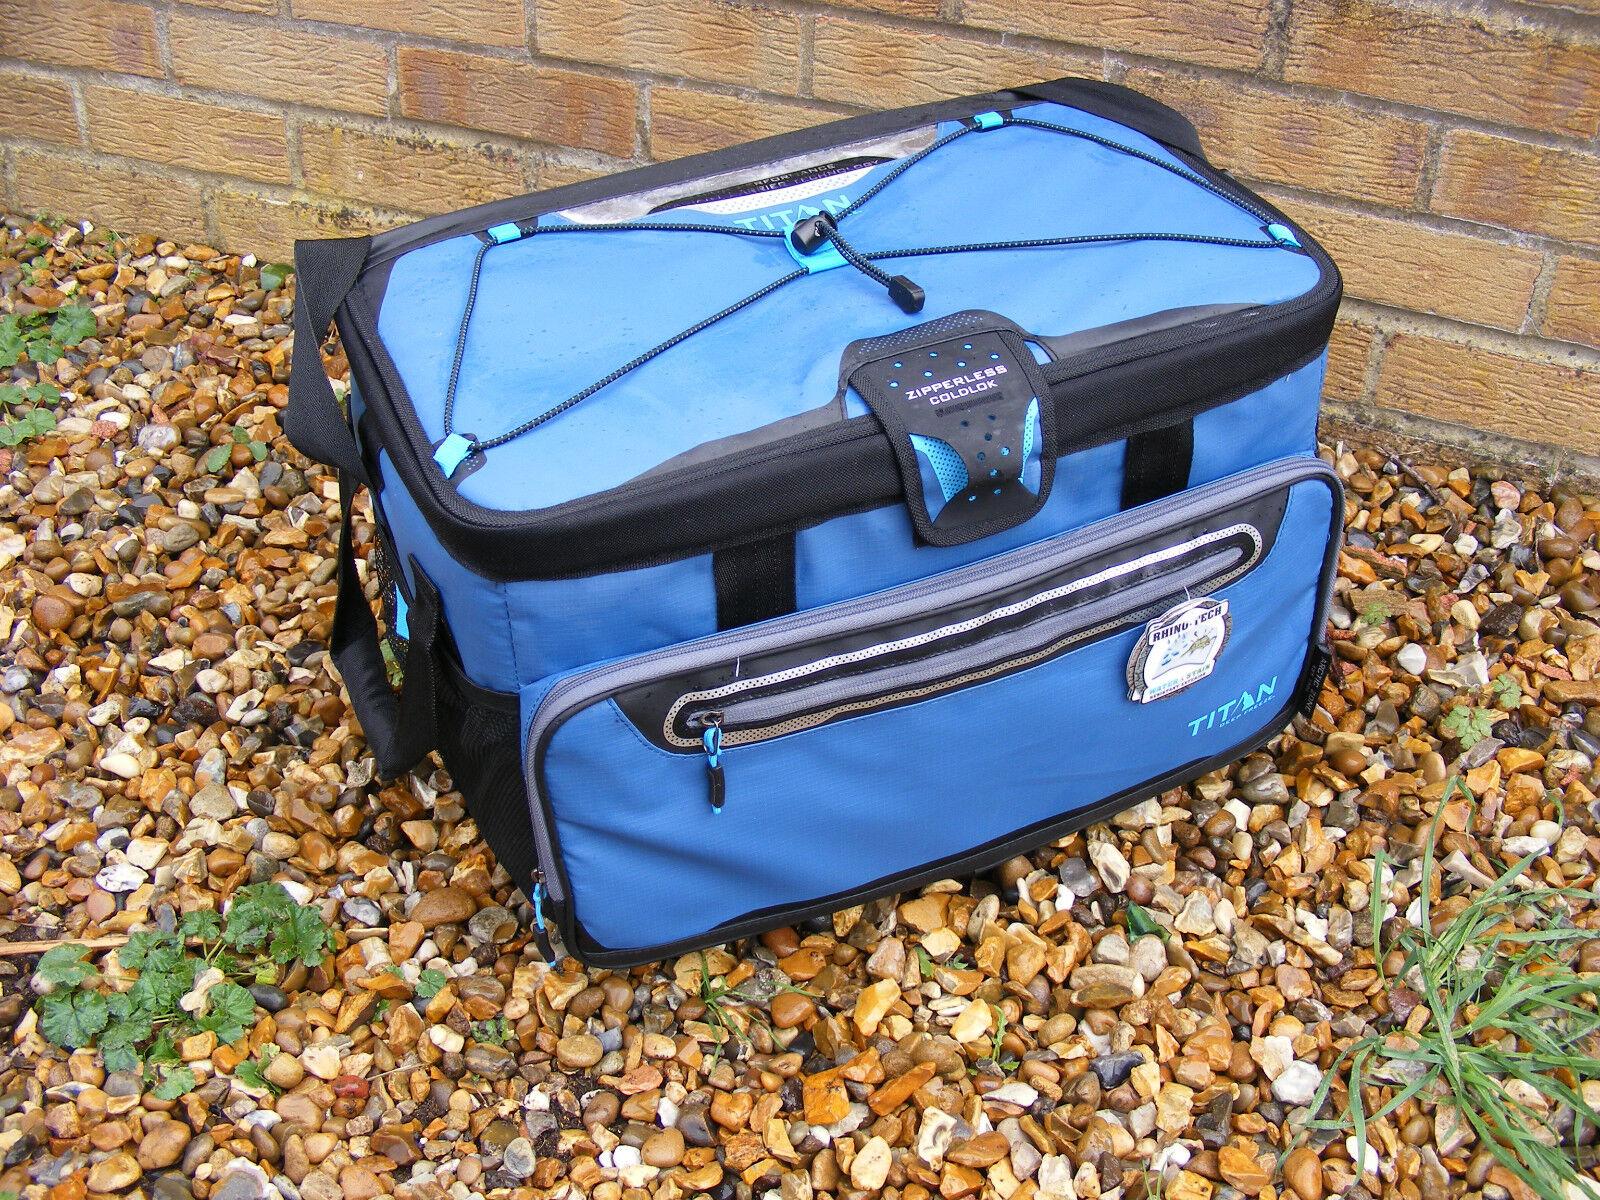 blu ARCTIC ZONE TITAN Stallo zipperless 48 può Cool Rhino-Tech Cooler Cool può borsa a7fdda